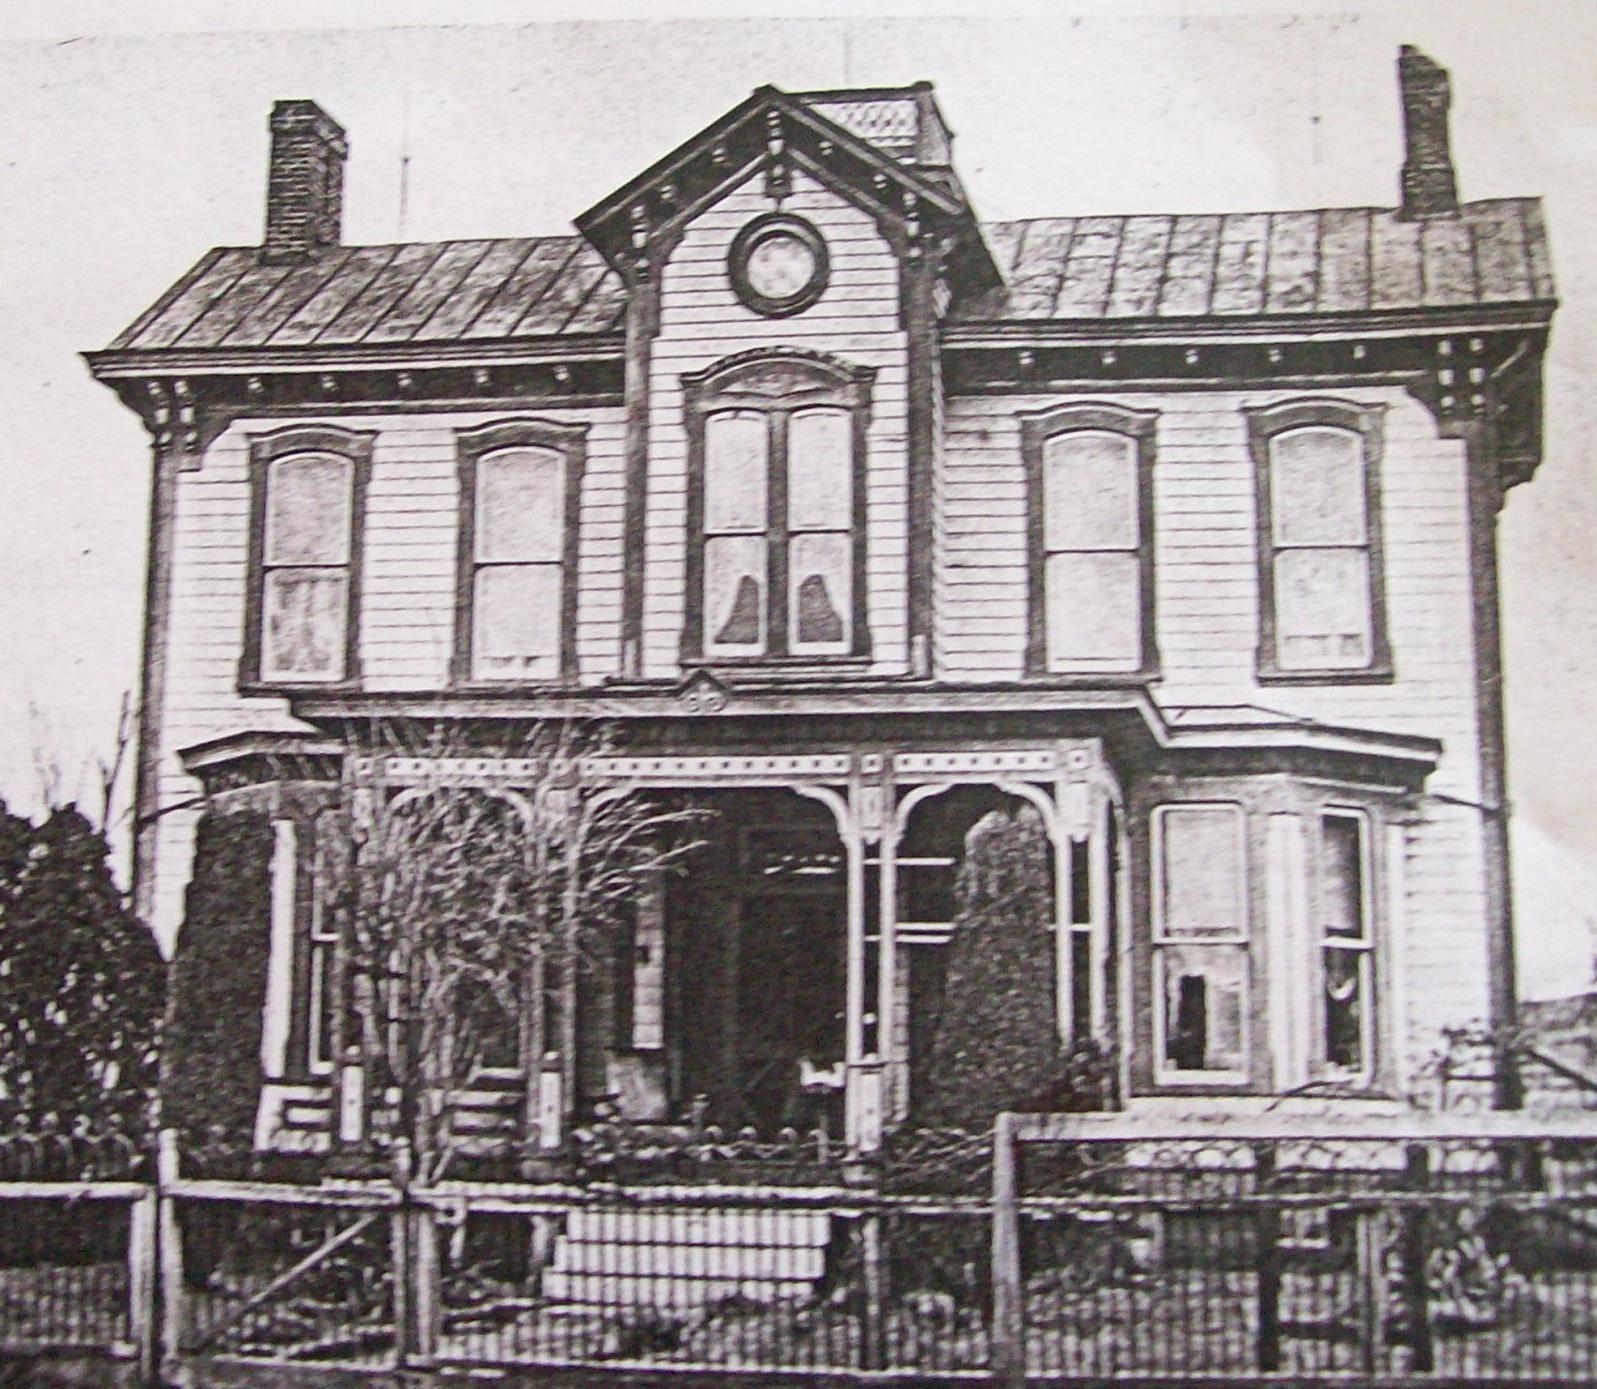 Barnett criss house wikipedia 201809015075118914968acea342c3684a2ba29daf8c7598a3214ed2d79813d9cd6f68cf4c1b25ed505d36f174ae584ae3f03694ec7f080005